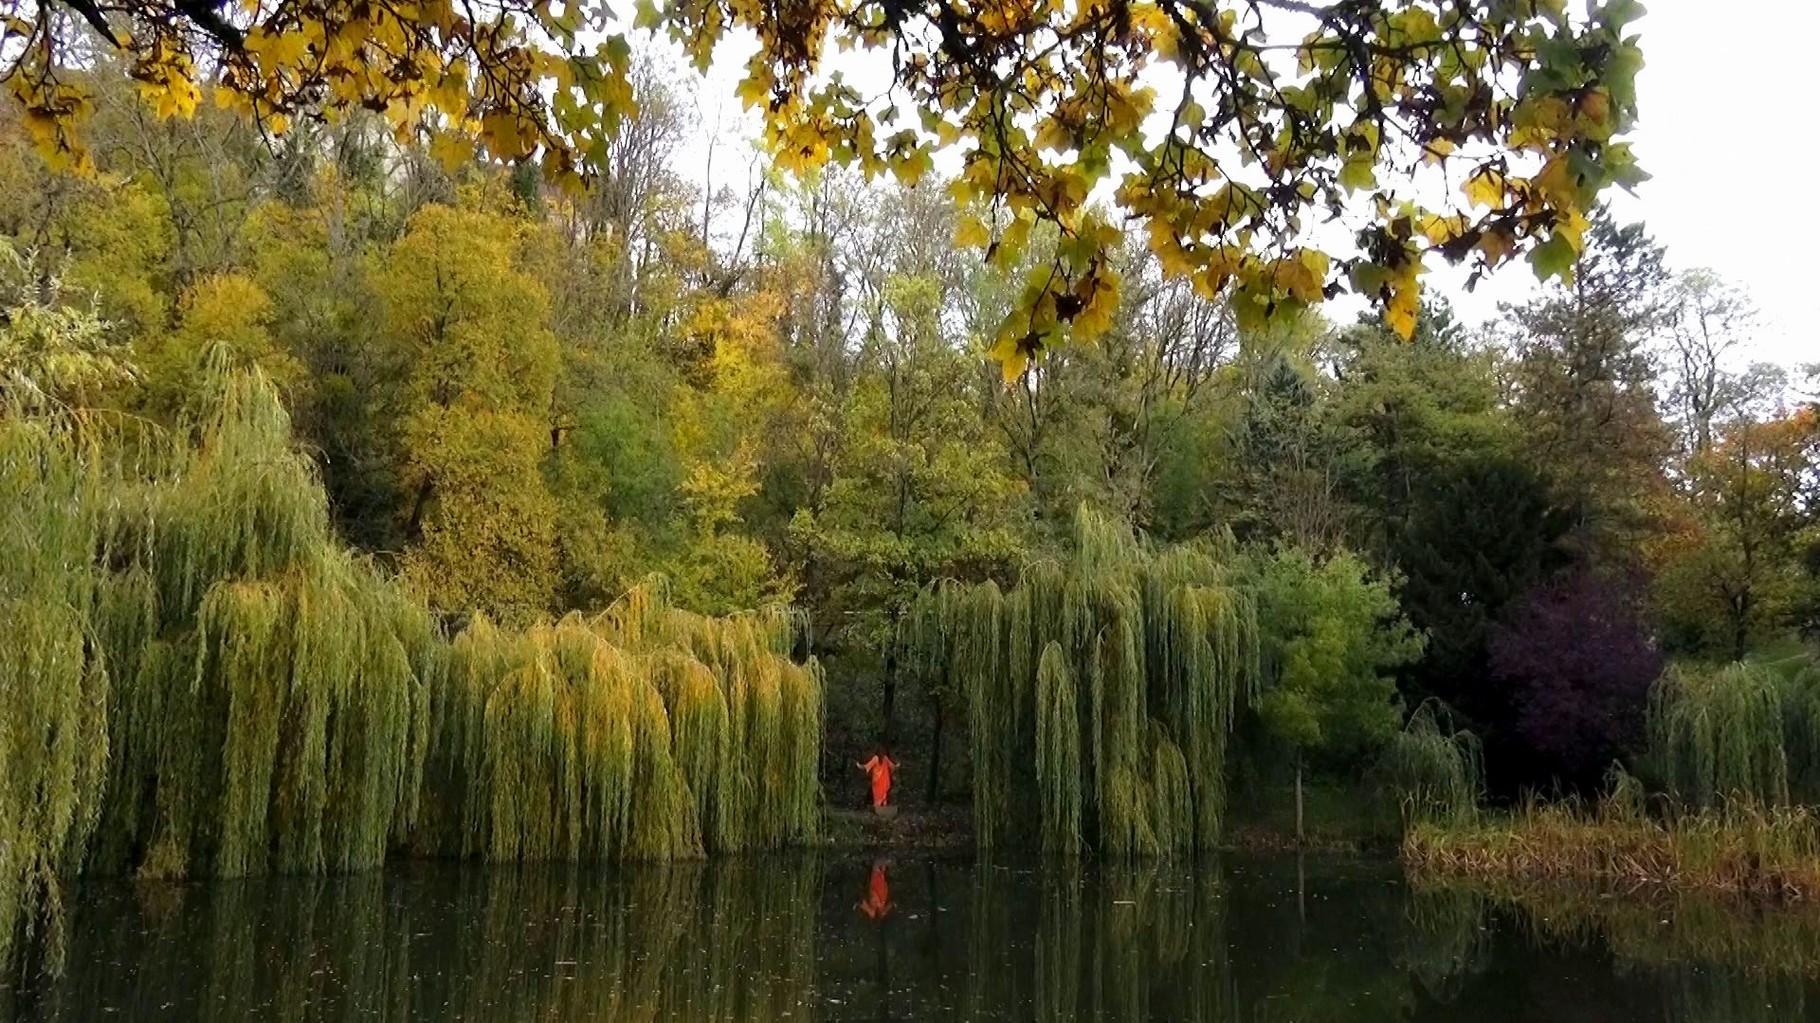 Fontaine-lès-Dijon_La Mare_drachin_photo zed terra 11/11/2014